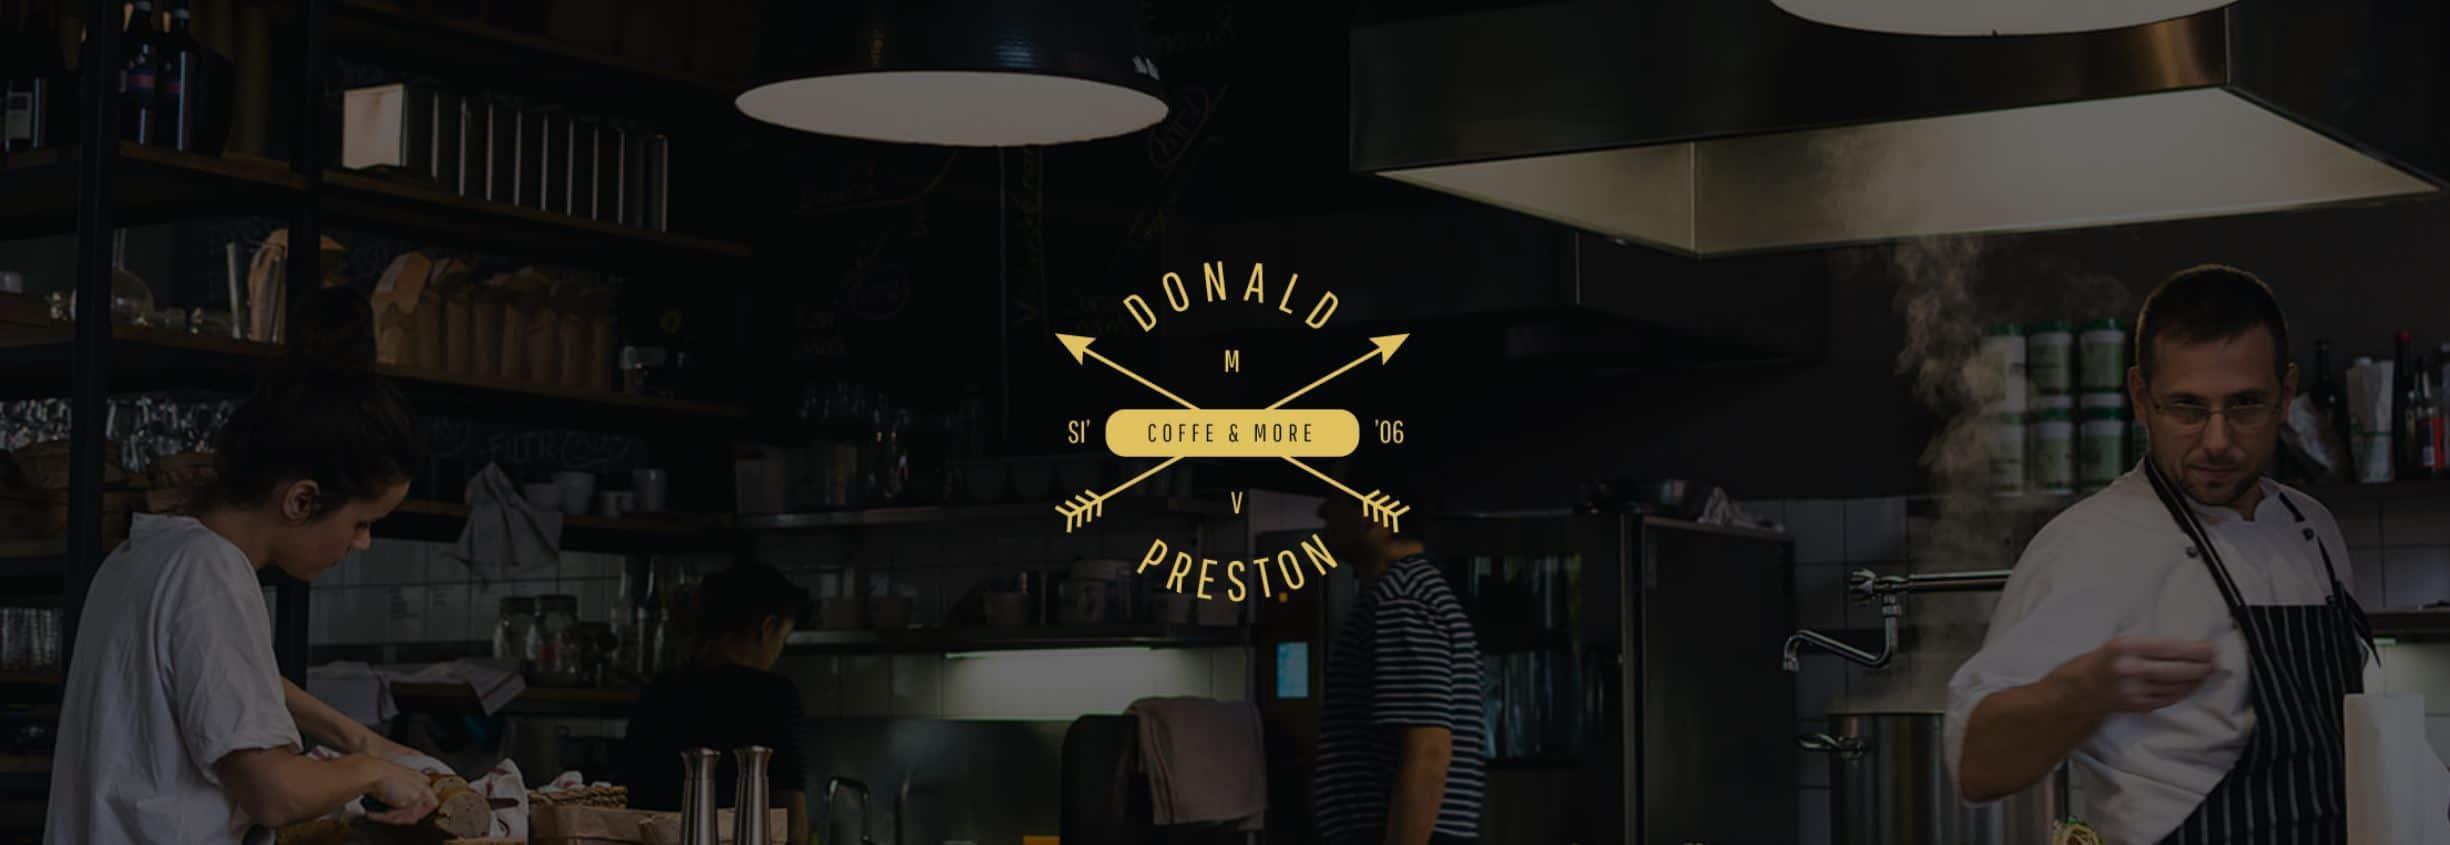 Elementor-restaurant